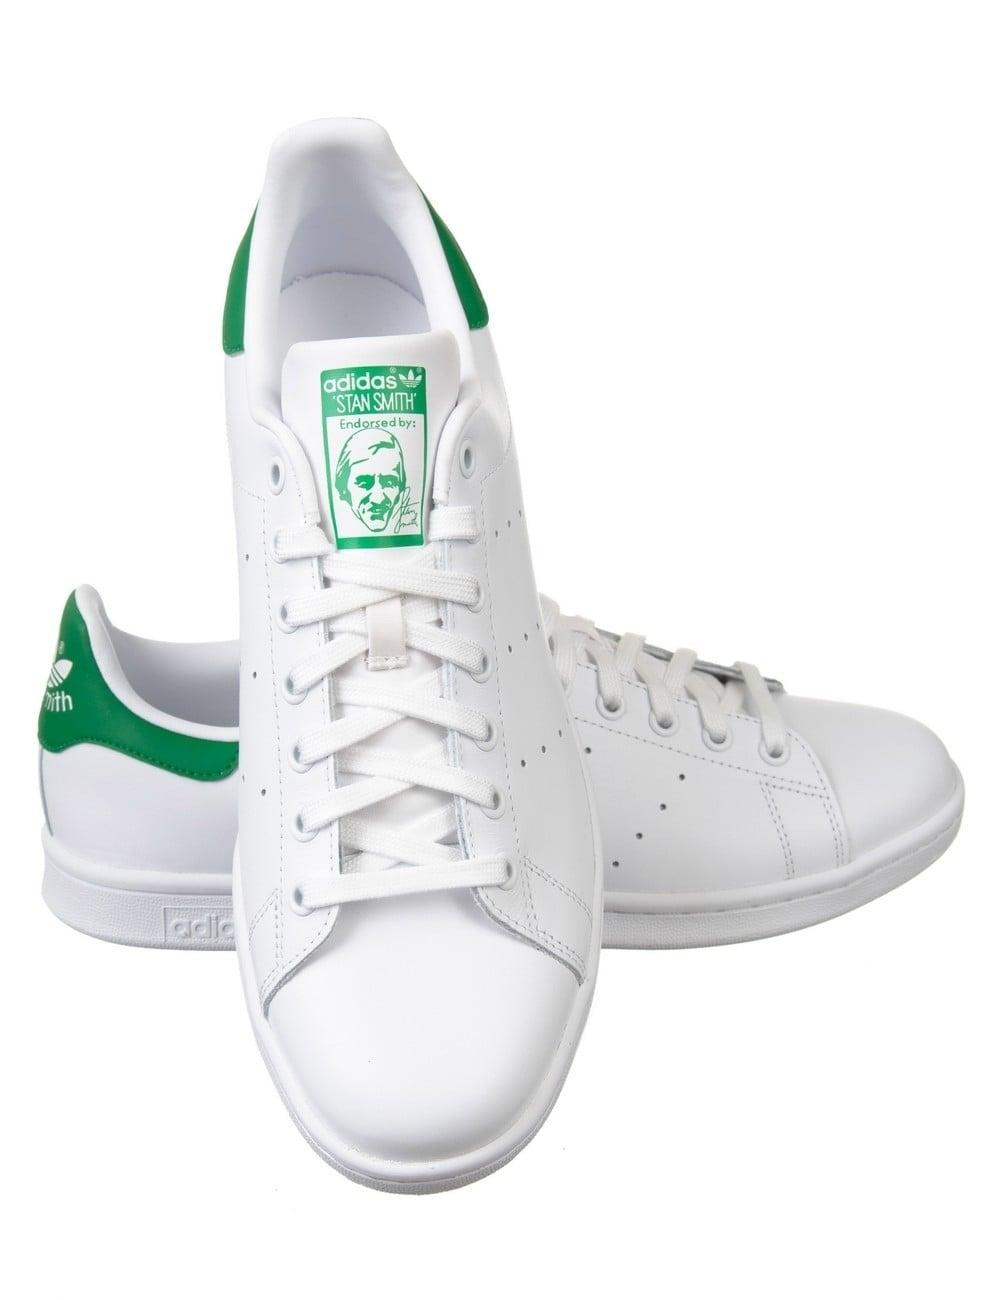 Adidas stan smith scarpe bianco / verde originali di calzature di grasso